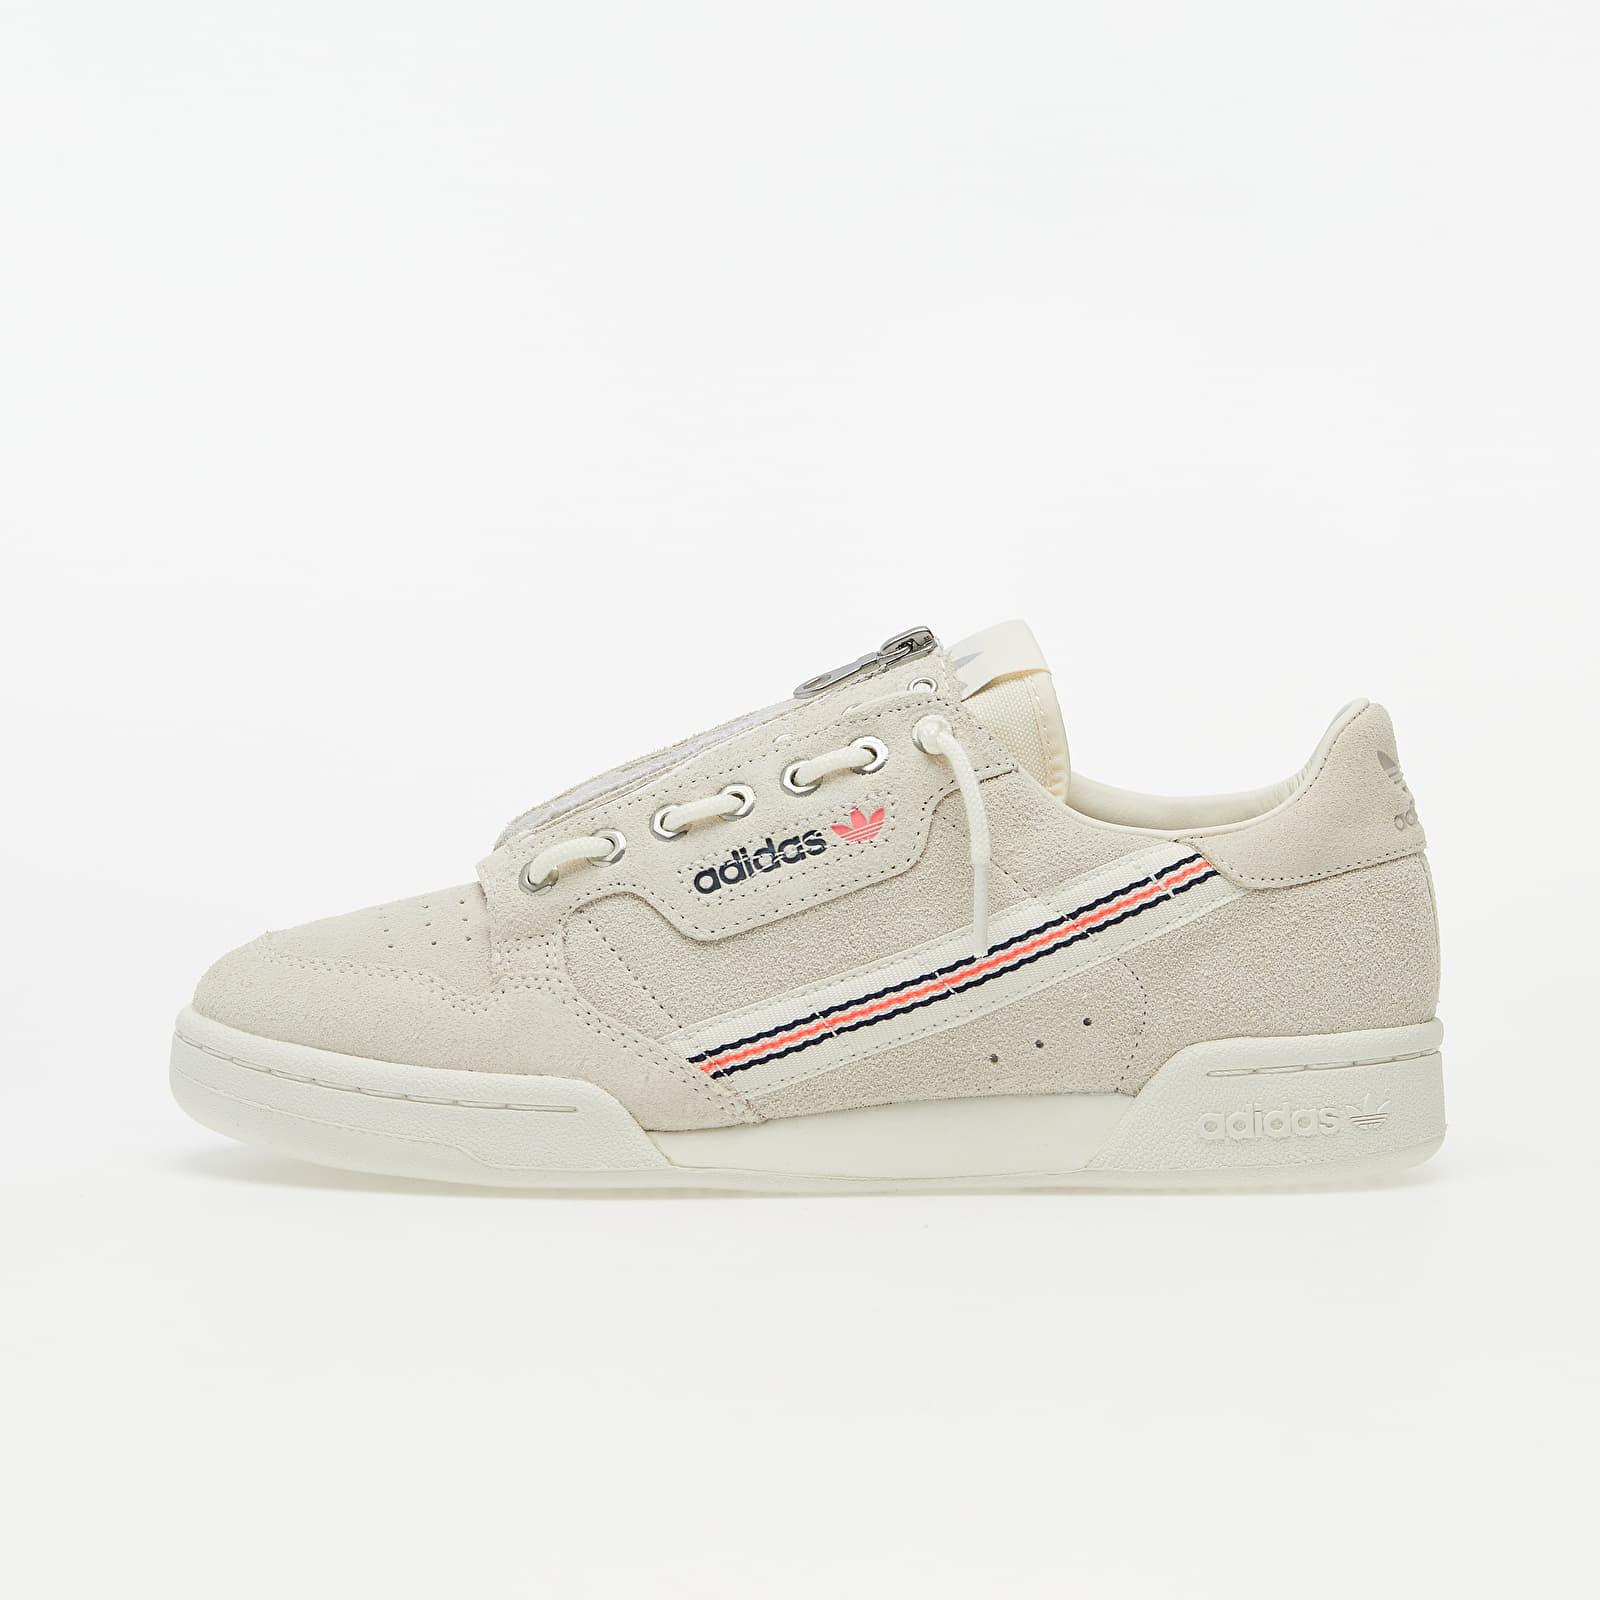 Men's shoes adidas Continental 80 Core